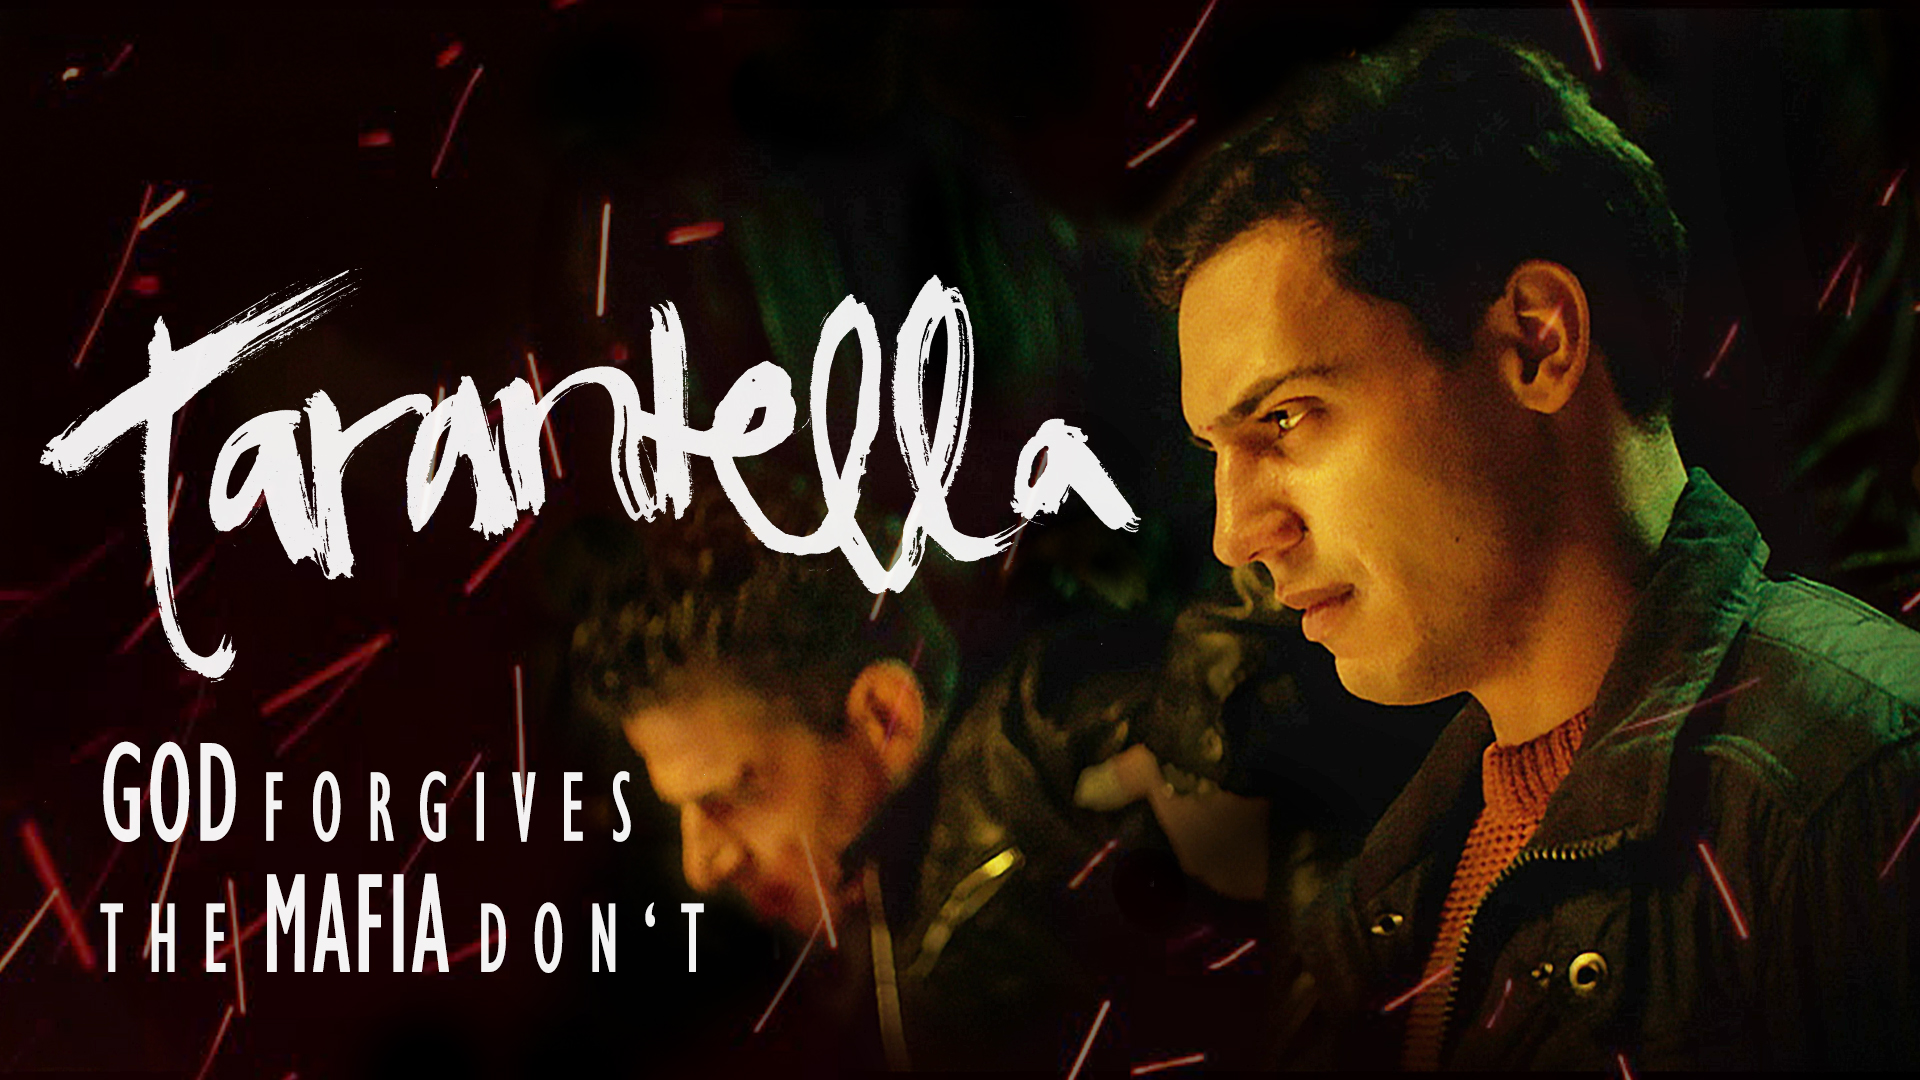 Tarantella - God forgives the Mafia don't (English Subtitled)